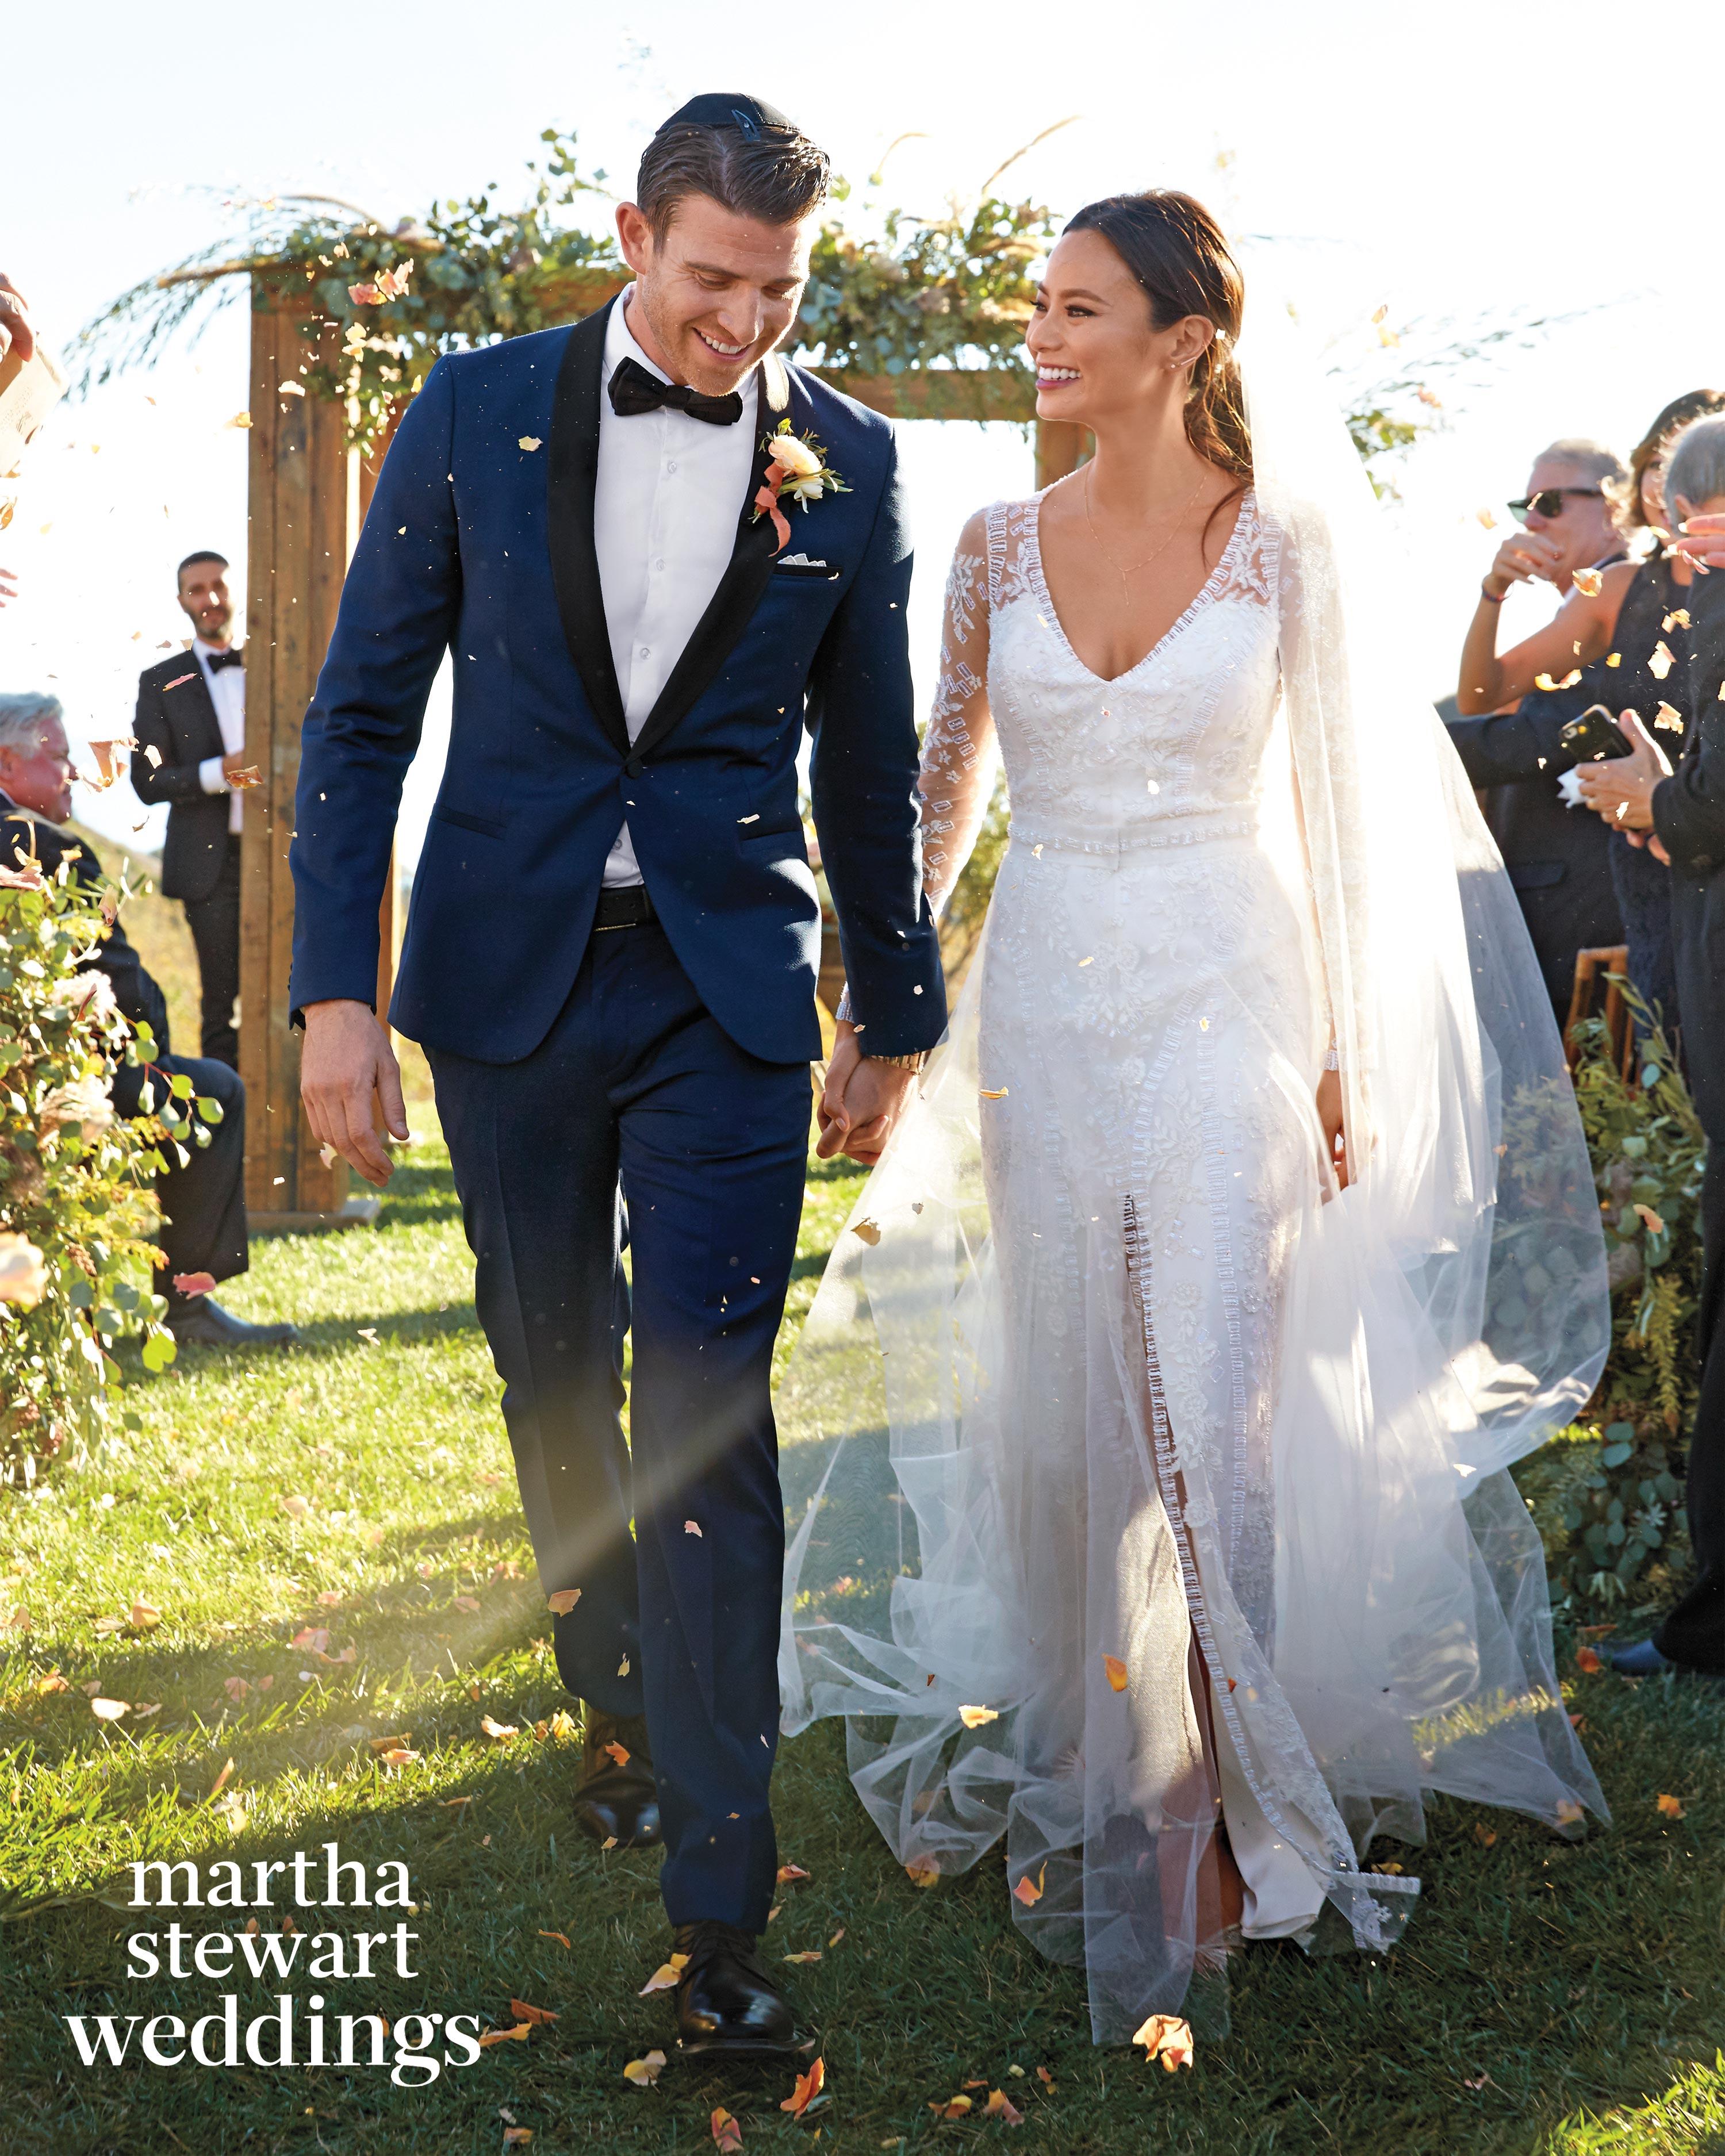 jamie-bryan-wedding-22-ceremony-2313-d112664.jpg